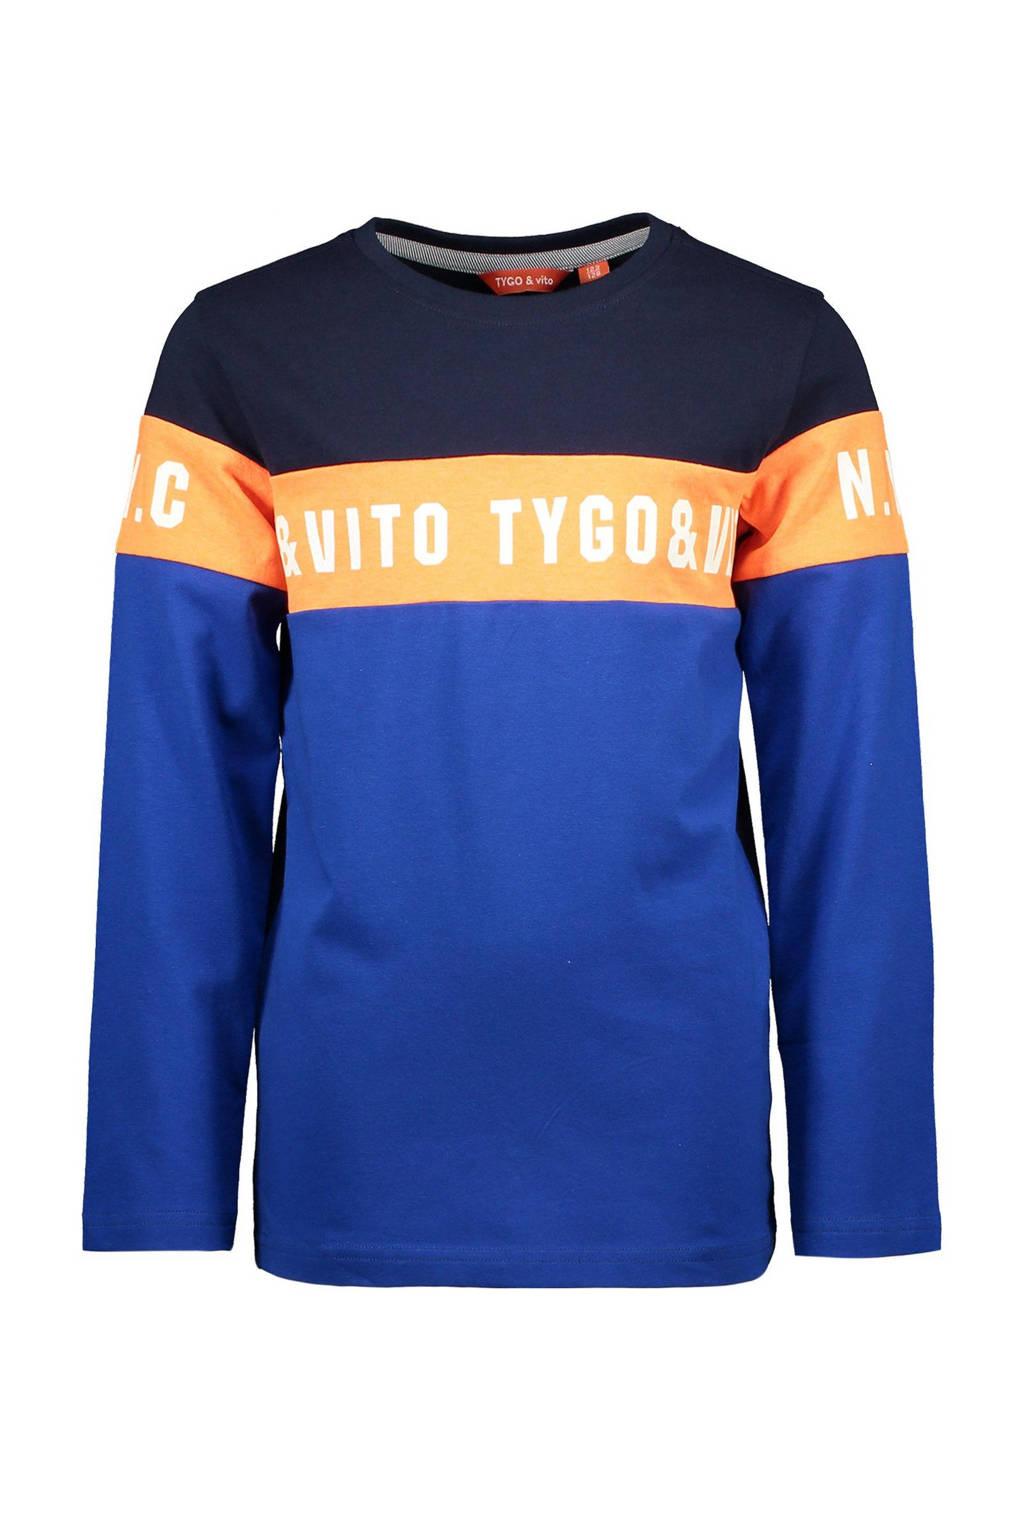 TYGO & vito longsleeve met tekst donkerblauw/blauw/oranje, Donkerblauw/blauw/oranje